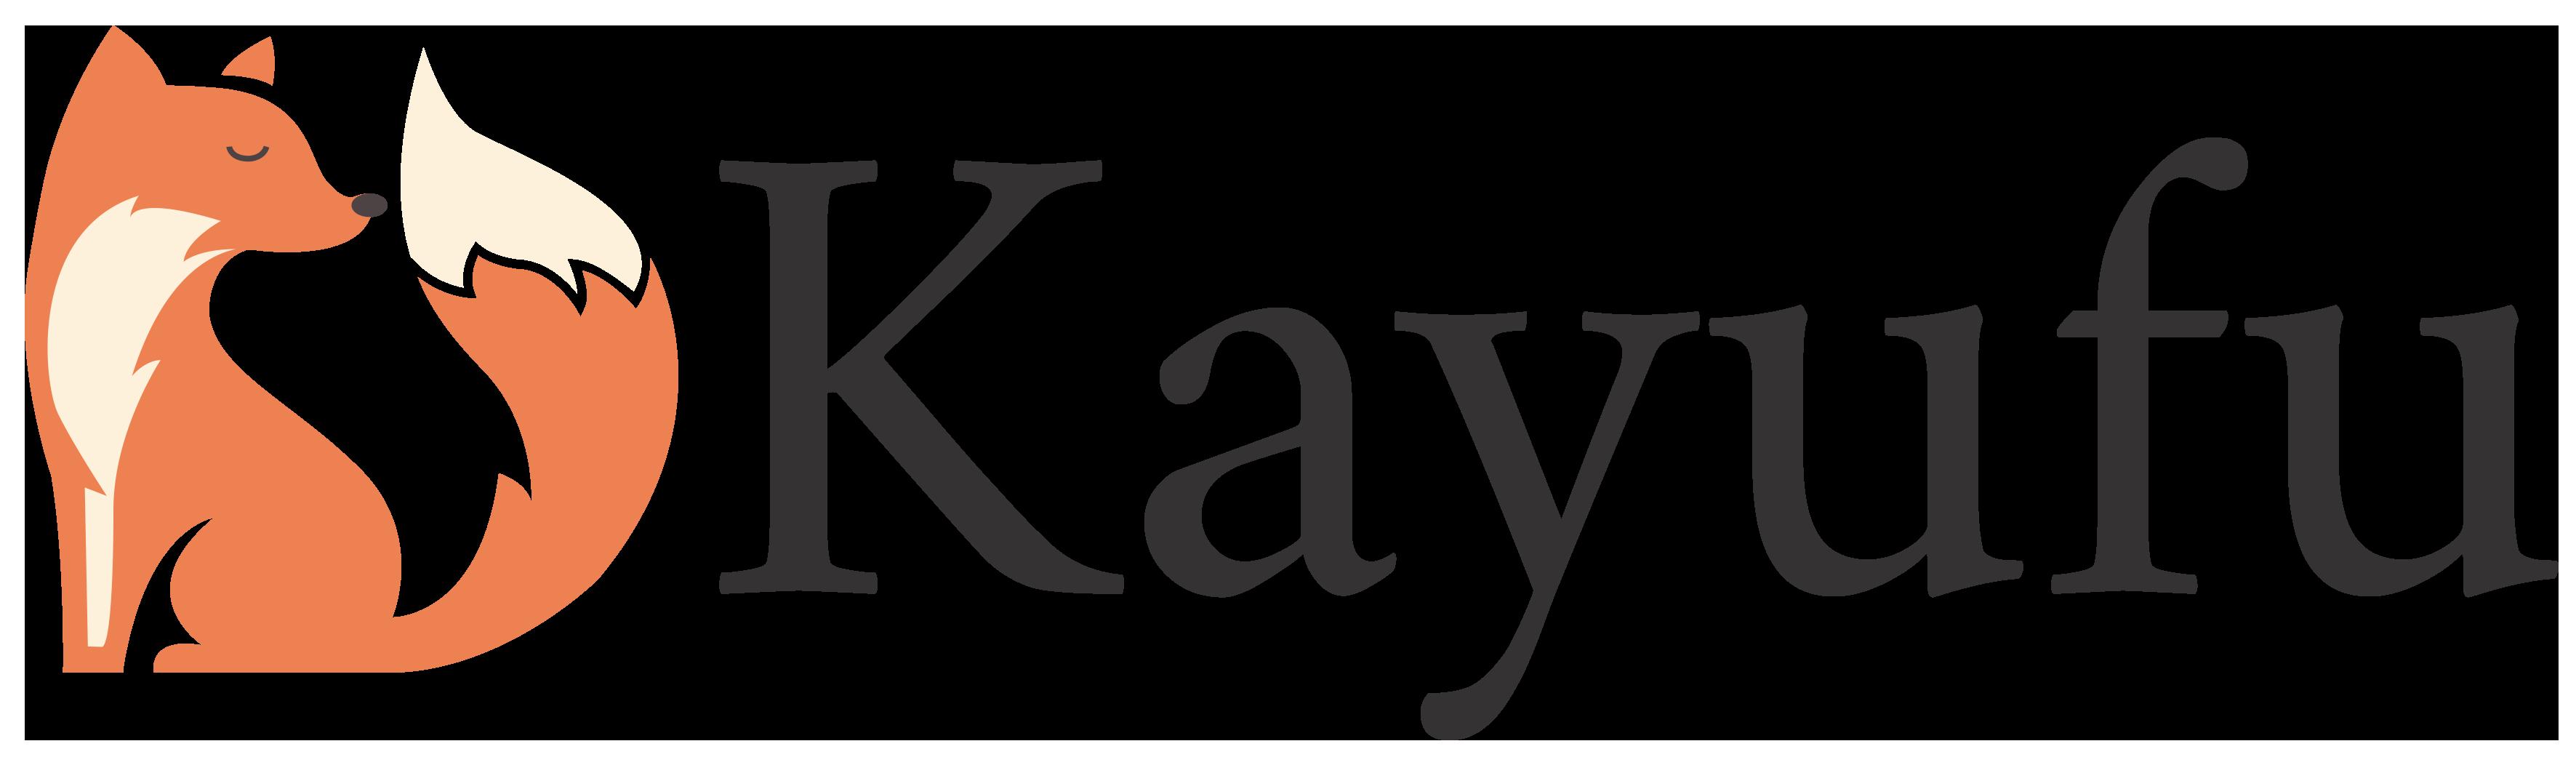 Kayufu (Platinum Sponsor)